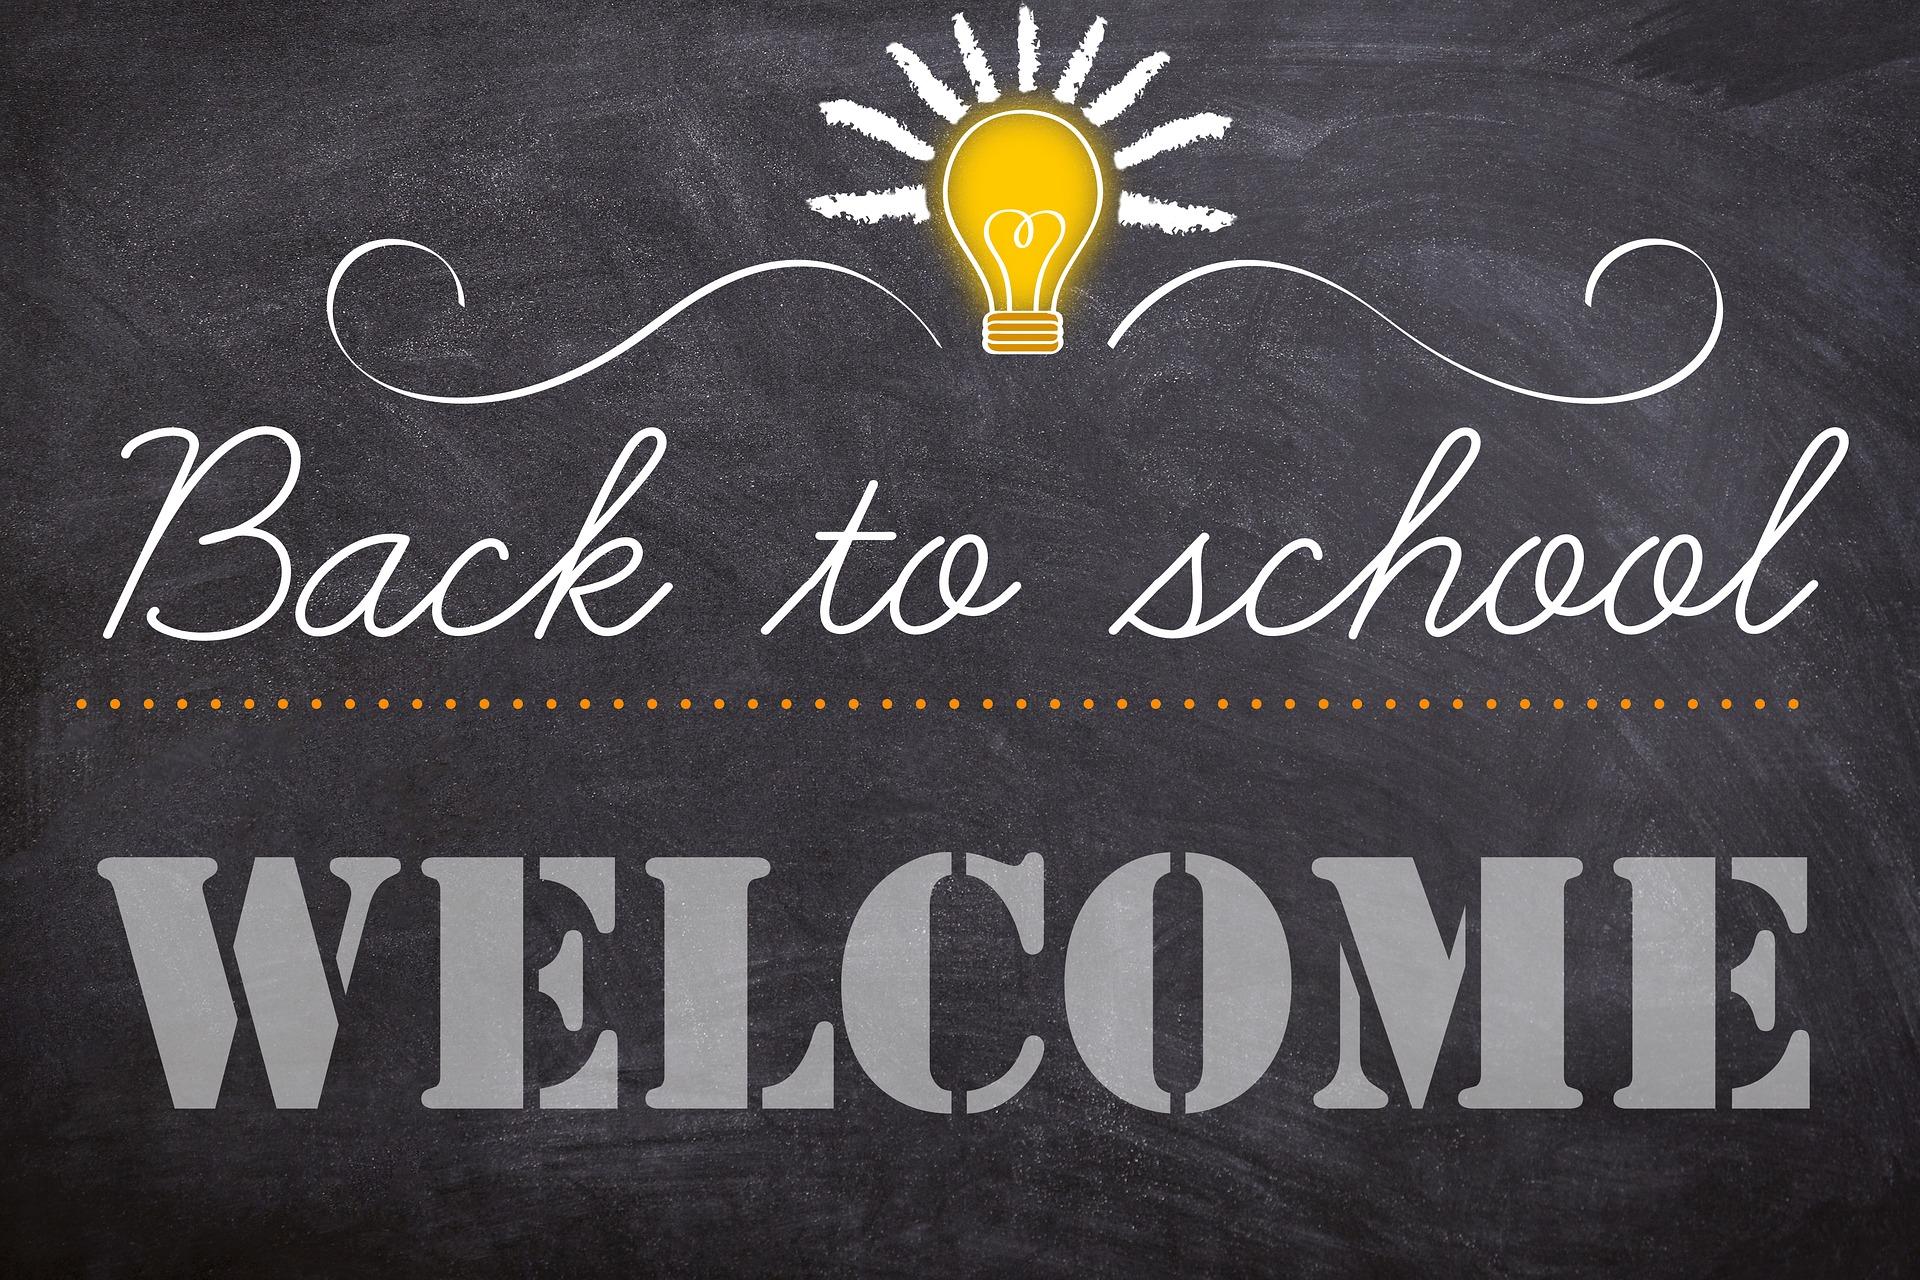 back-to-school-2628013_1920.jpg